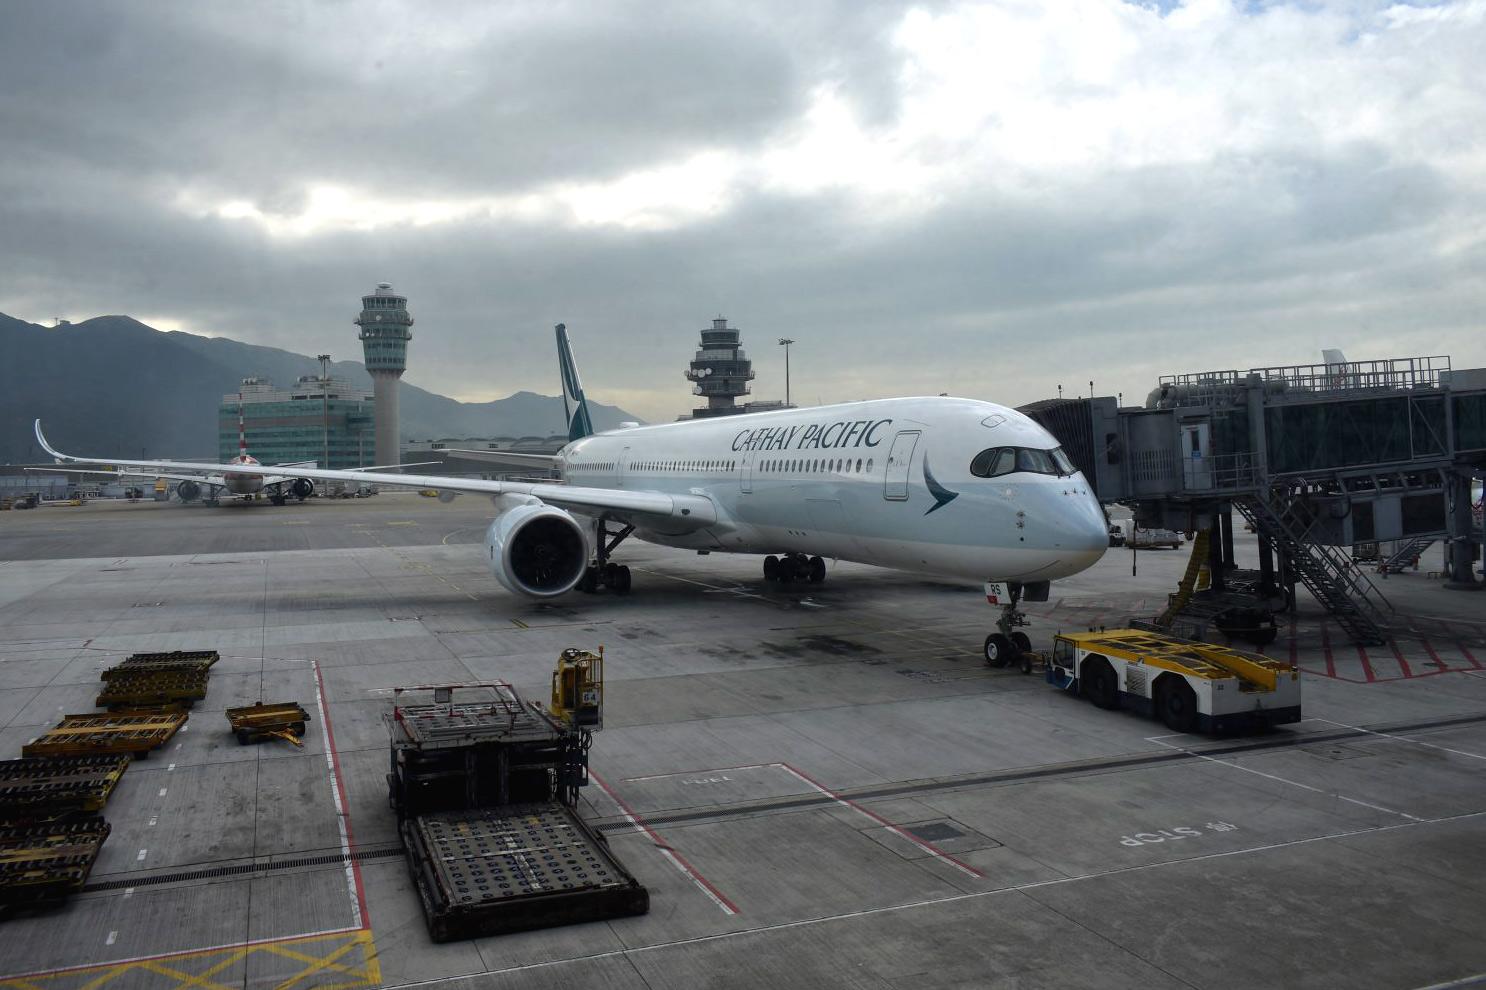 Airbus A350-900 авиакомпании Cathay Pacific перед взлетом в аэропорту Гонконга